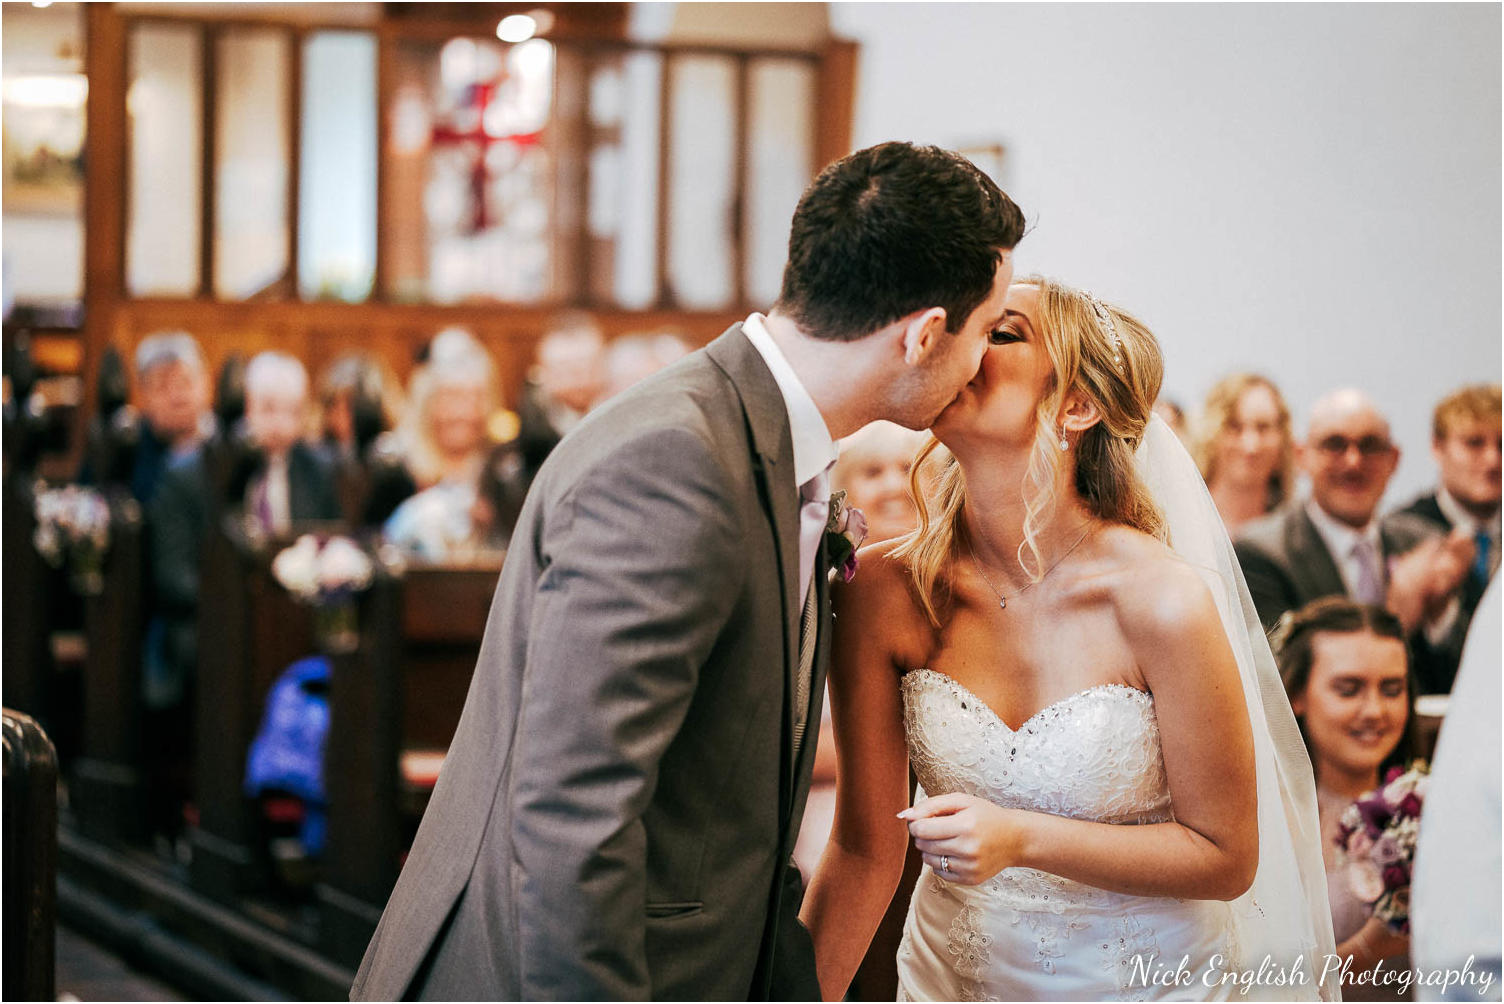 Mitton_Hall_Wedding_Photographer_2018-67.jpg